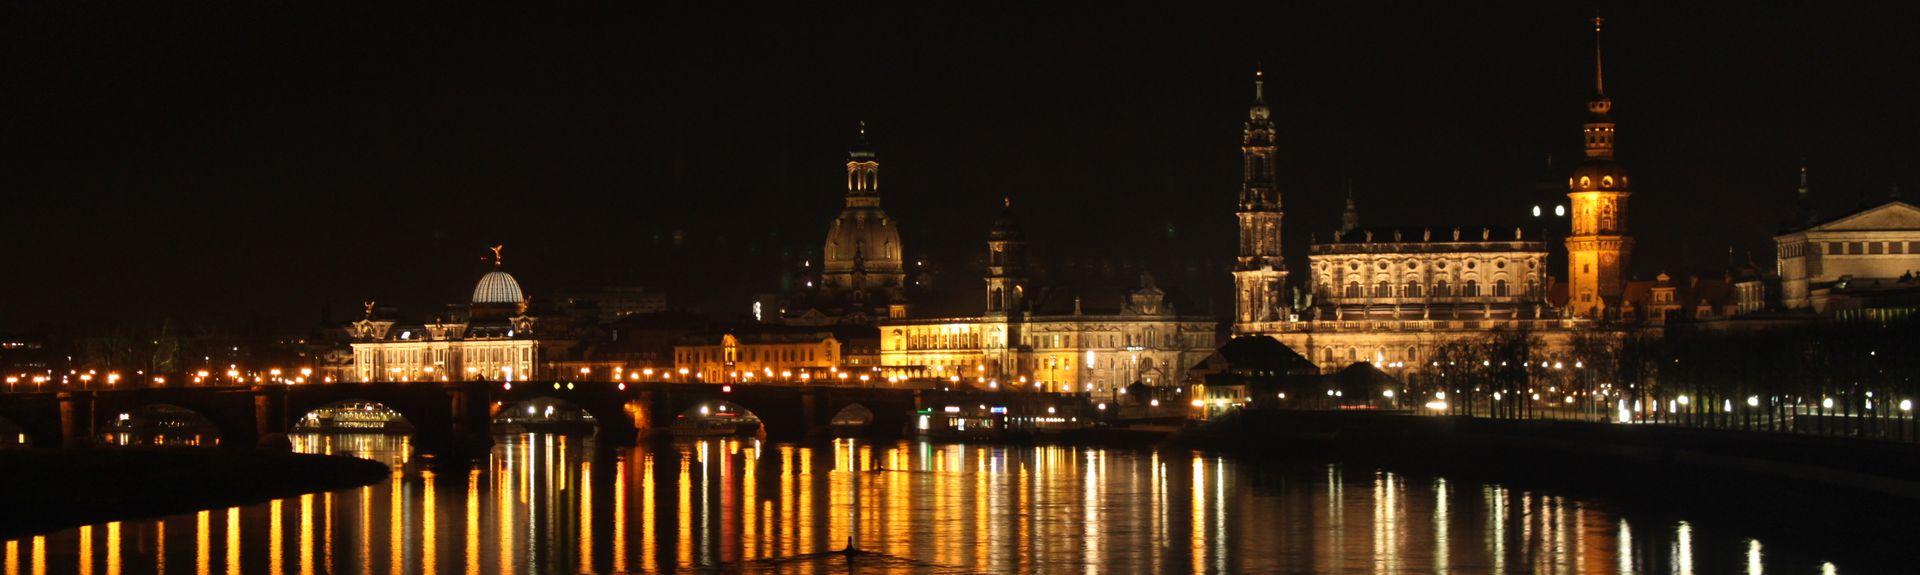 Schönfeld - Weißig, Dresden, Germany